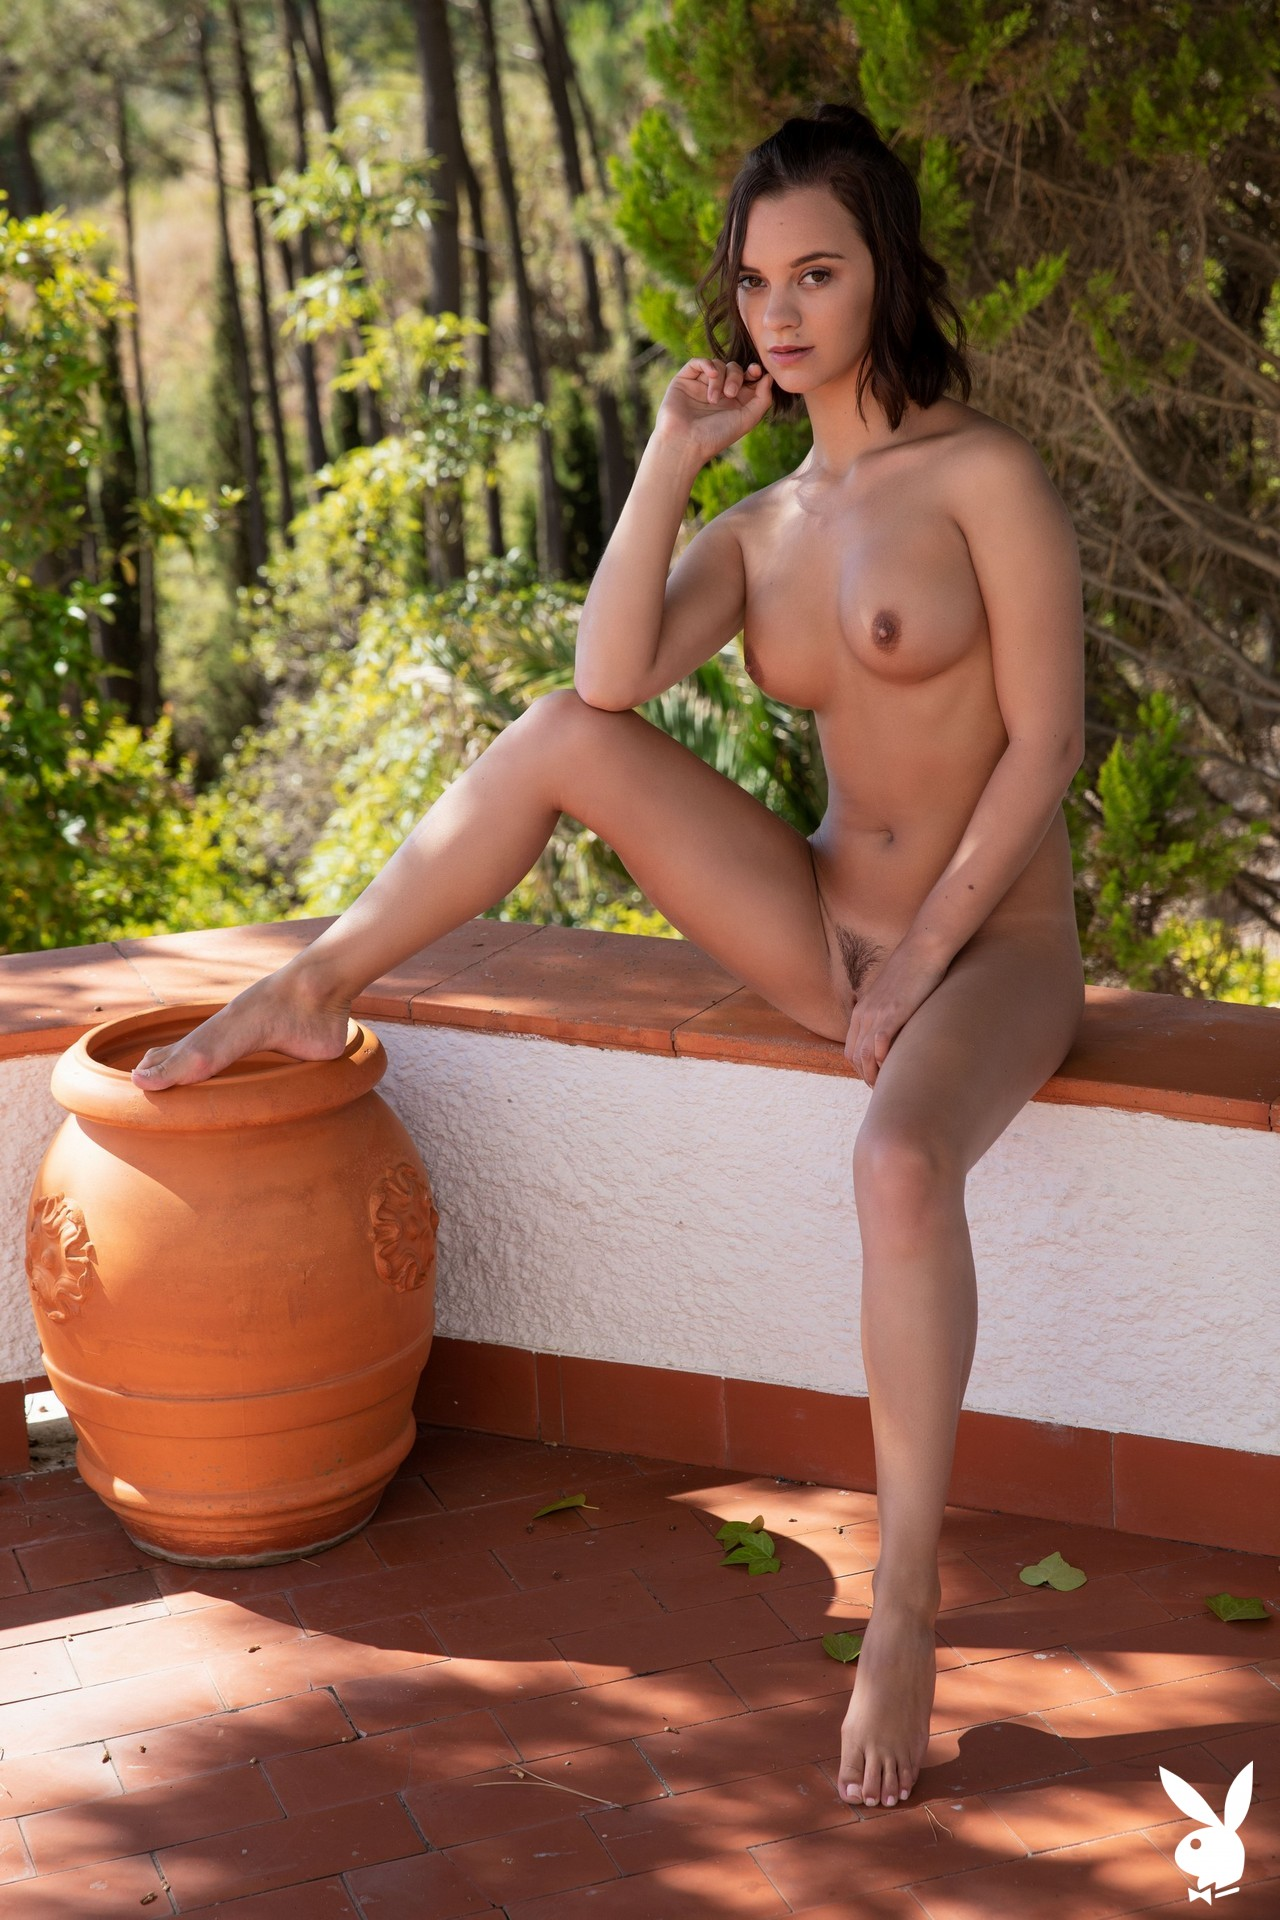 Marine Lecourt In Country Summit Playboy Plus (20)